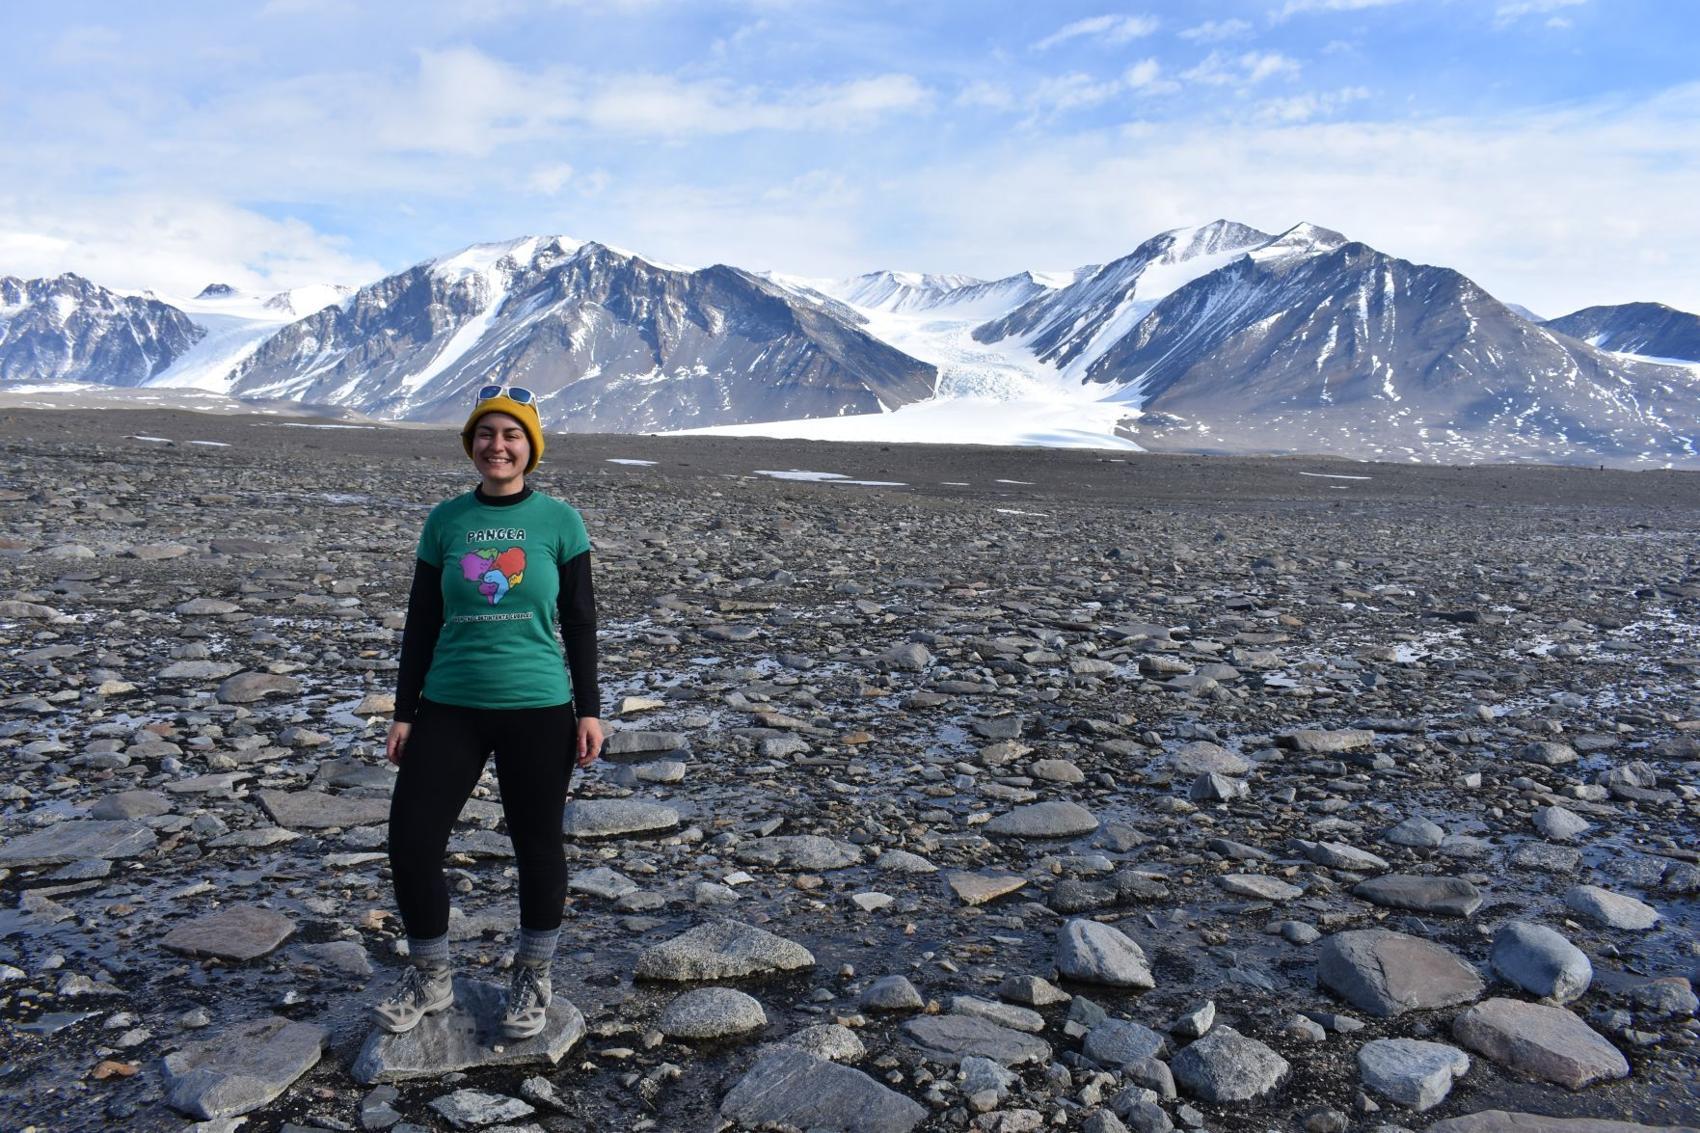 Schuyler Borges in Antarctica